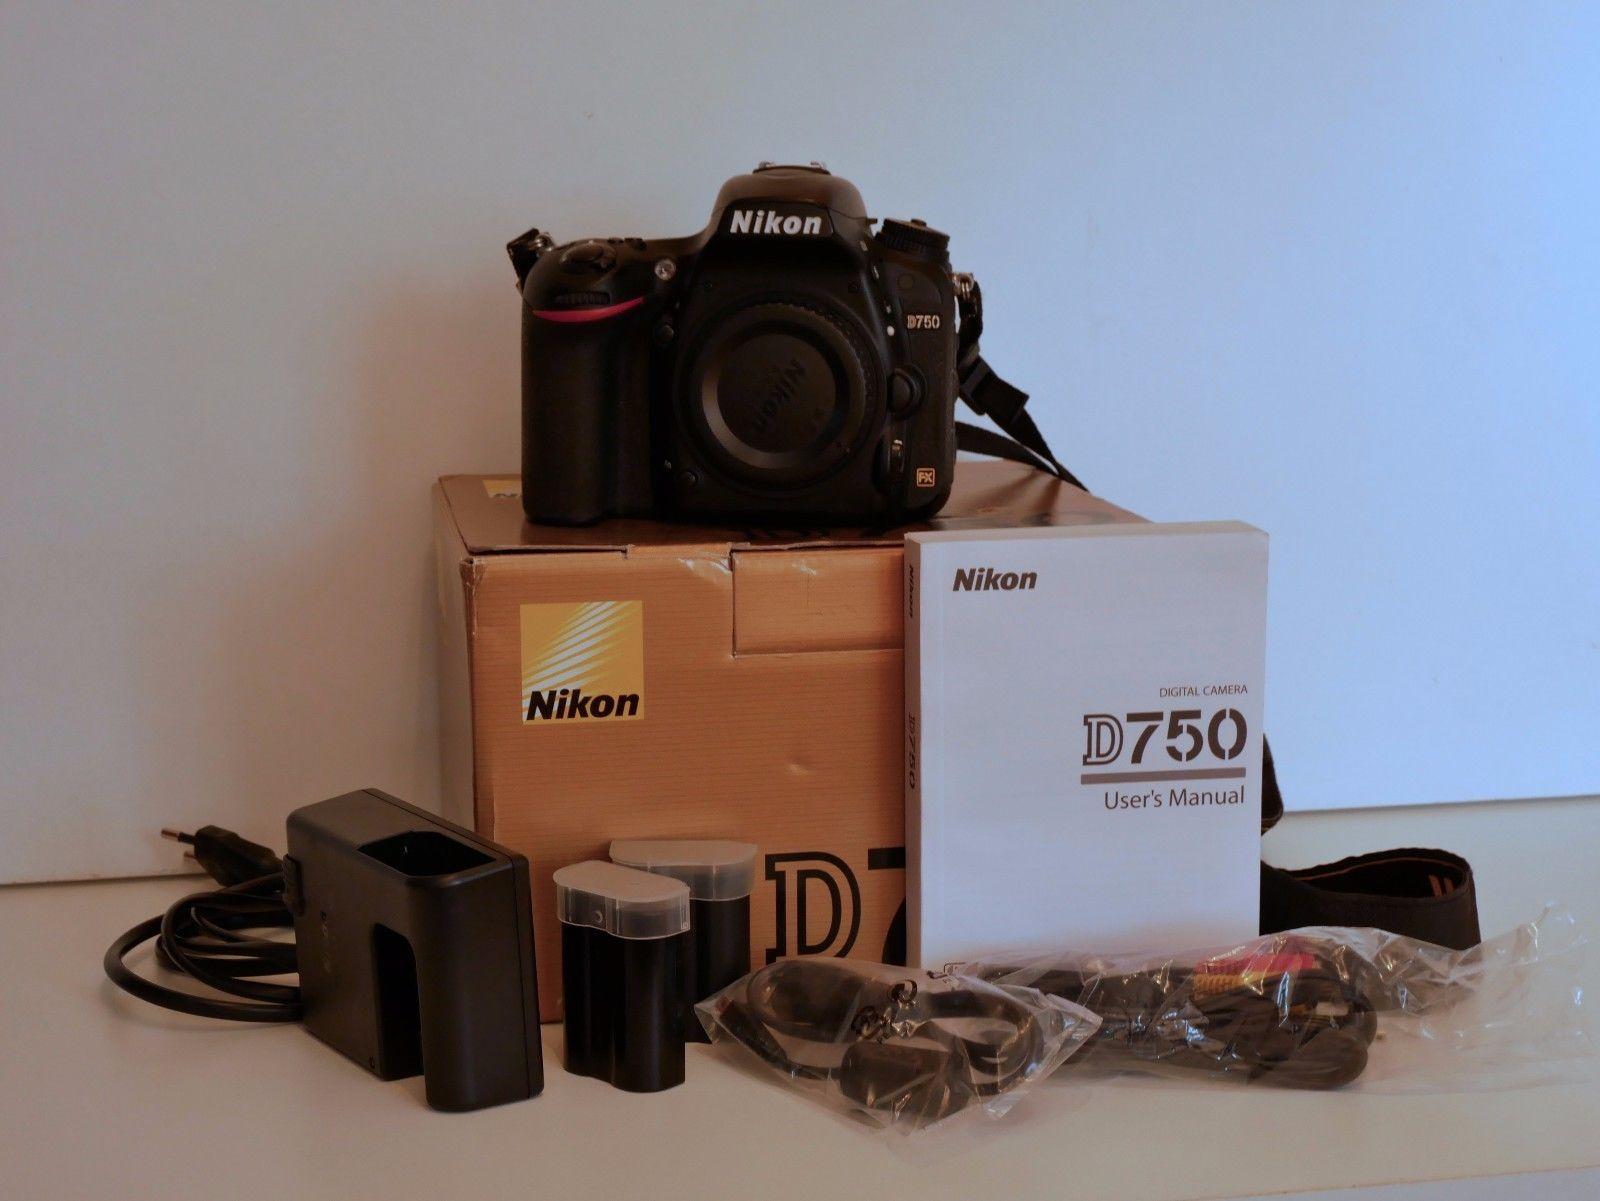 Nikon D750 Body, semiprofessionell, engl. Modell, 2 Jahre alt